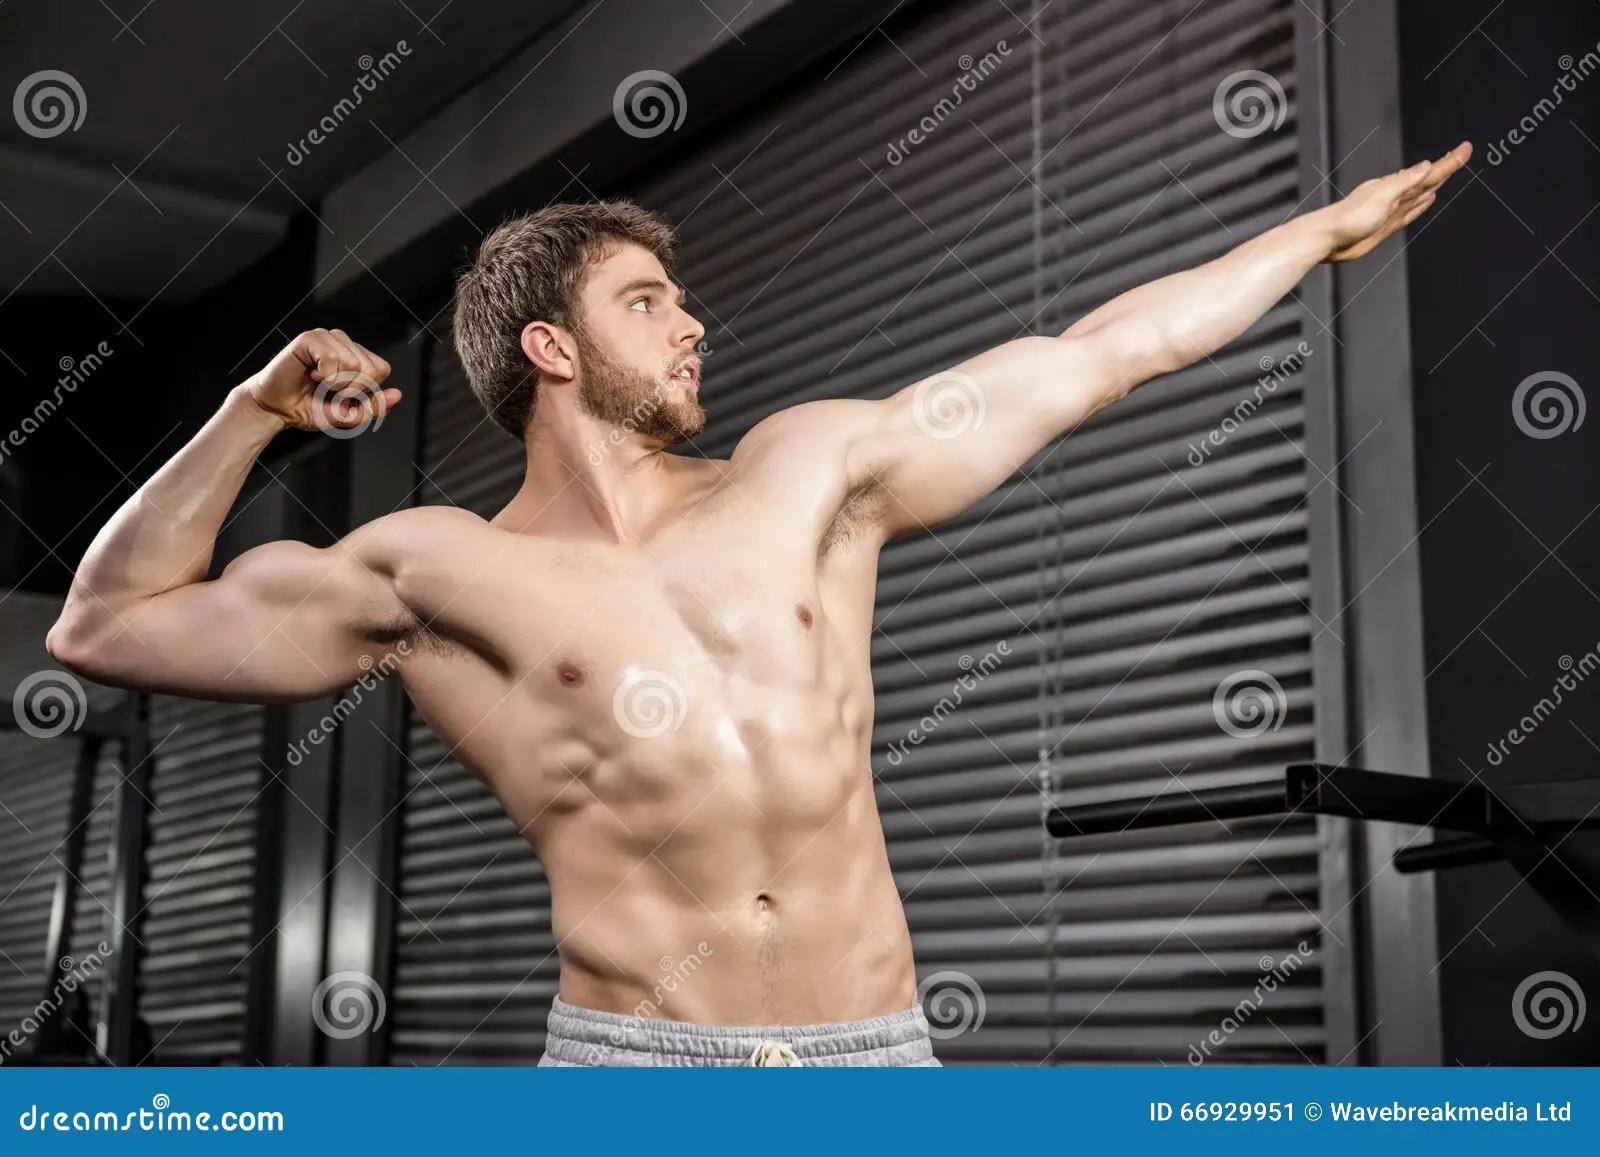 shirtless man flexing muscles